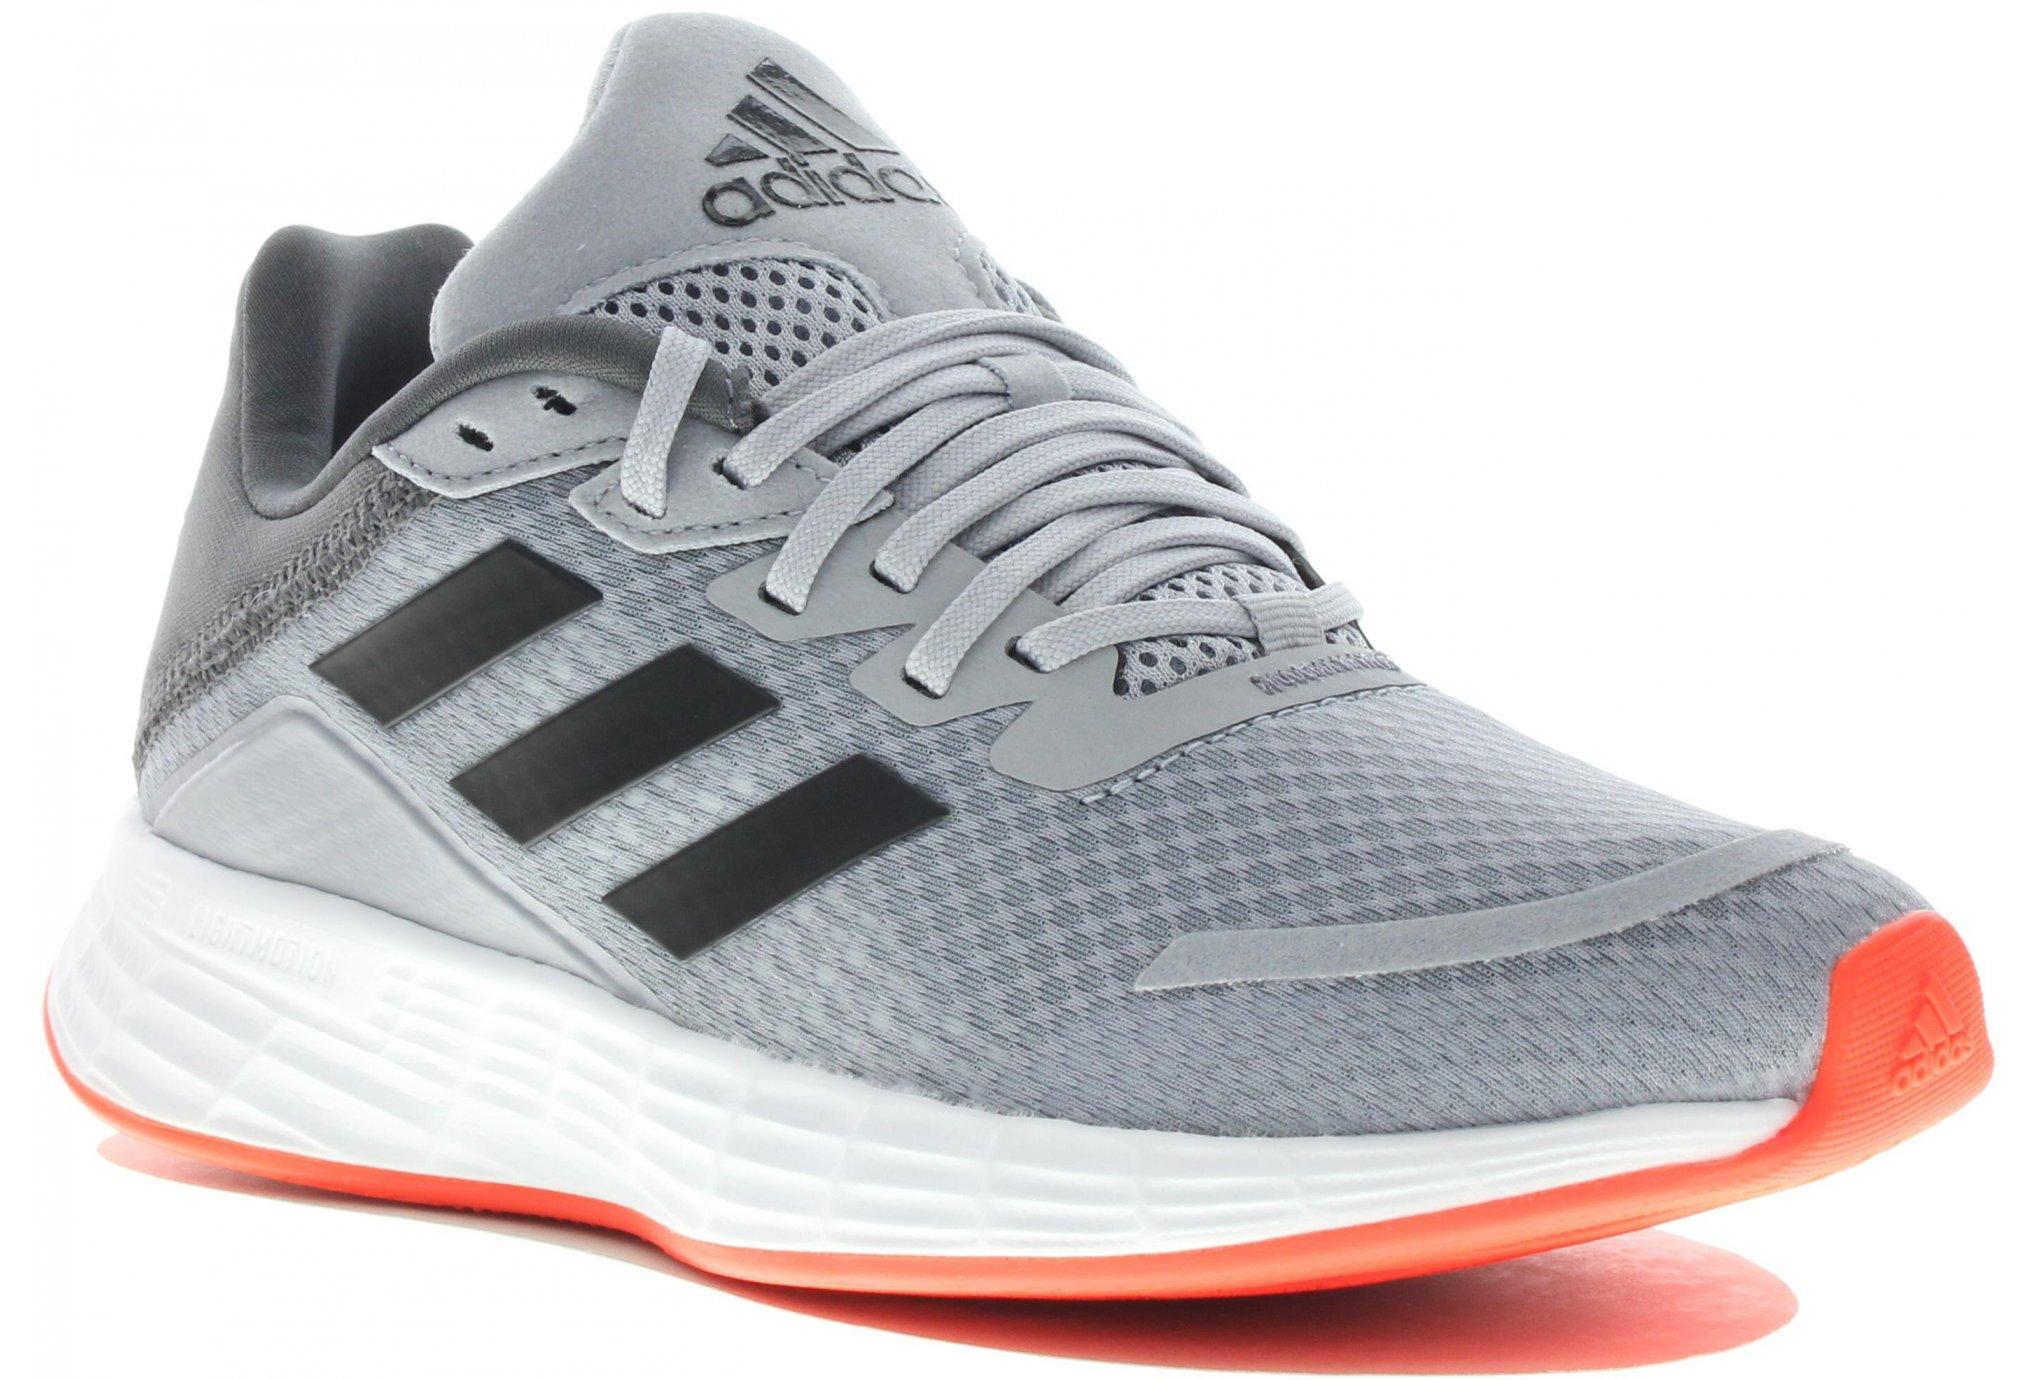 adidas Duramo SL Fille Chaussures running femme